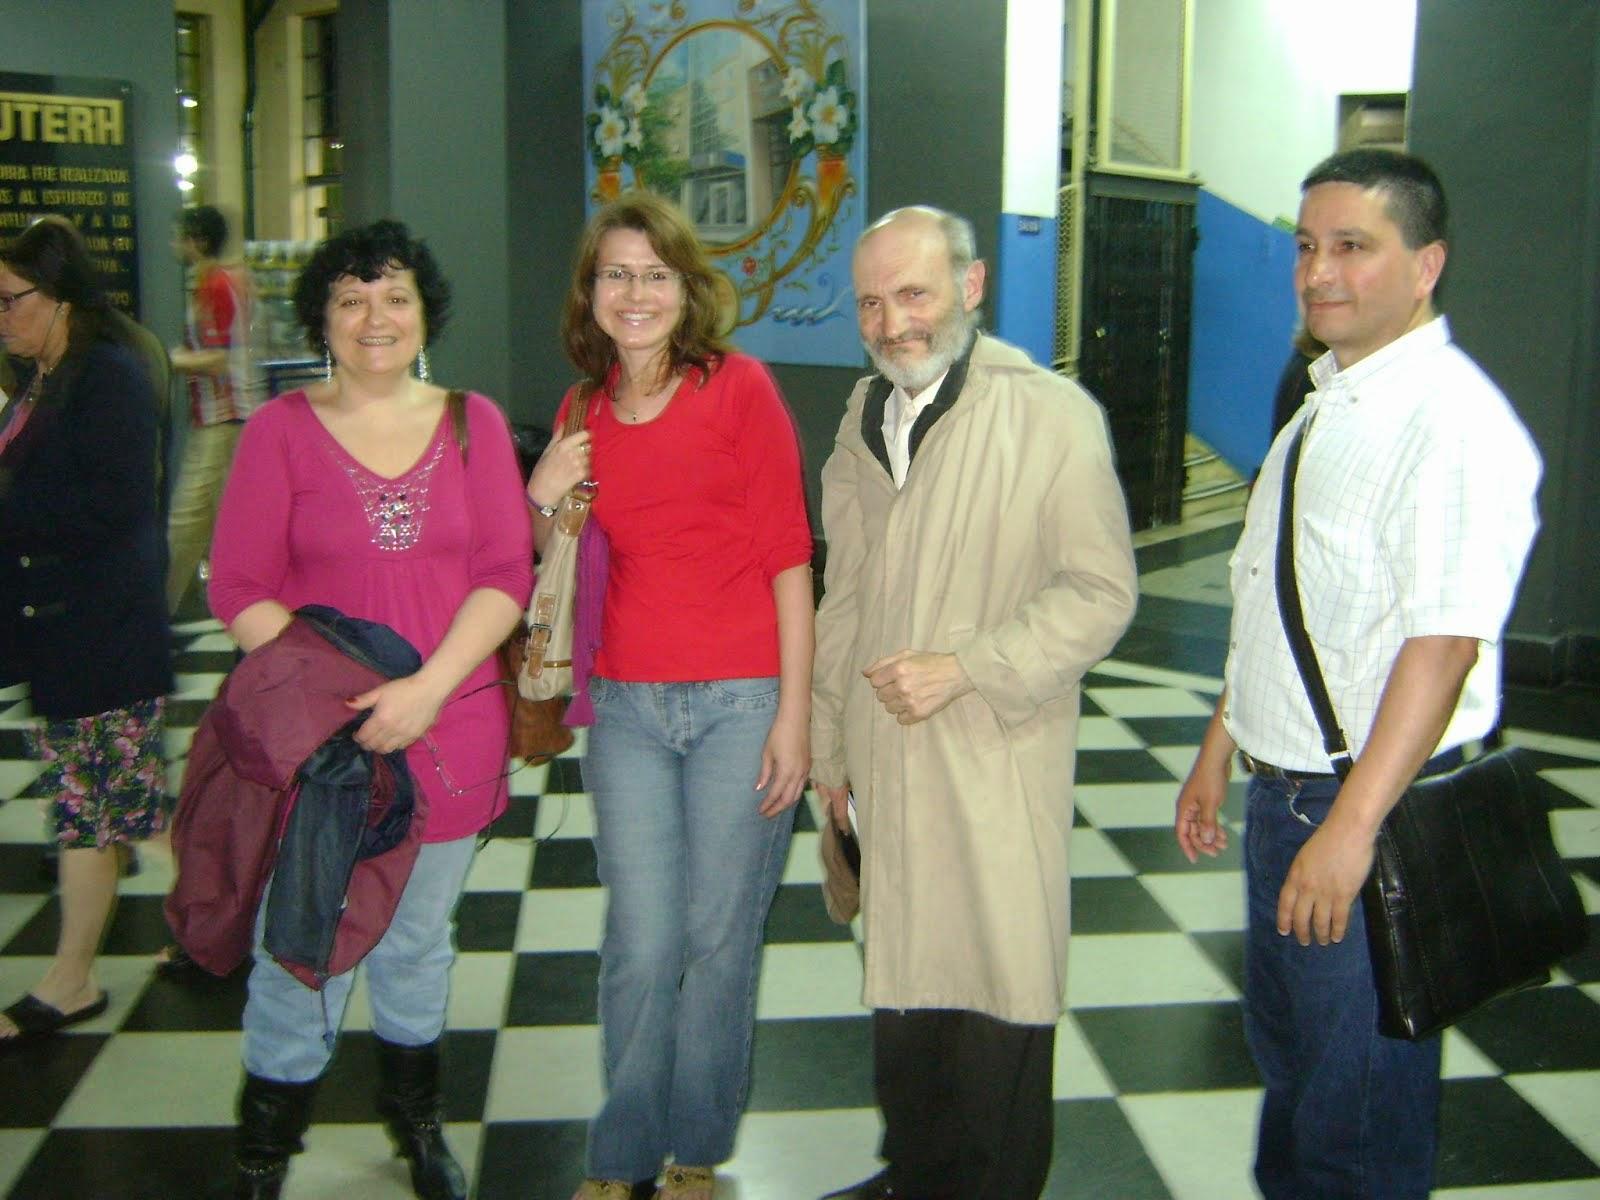 Miércoles 3 de noviembre de 2010, último Parrafus en vivo